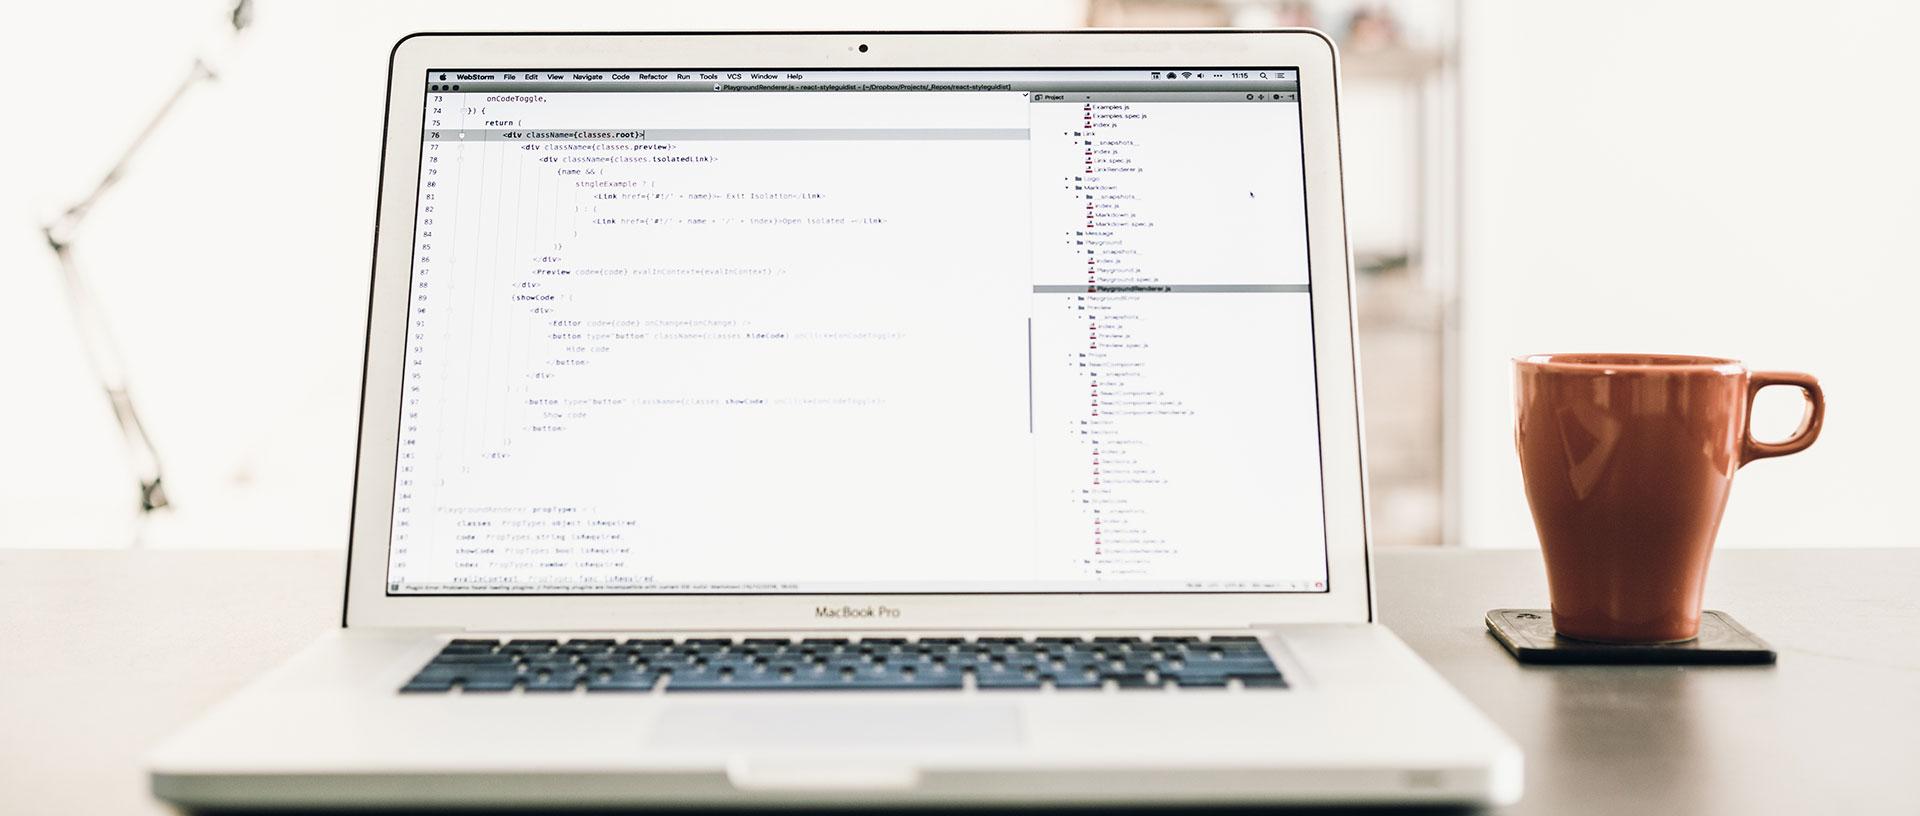 Software gestionale per strutture ricettive